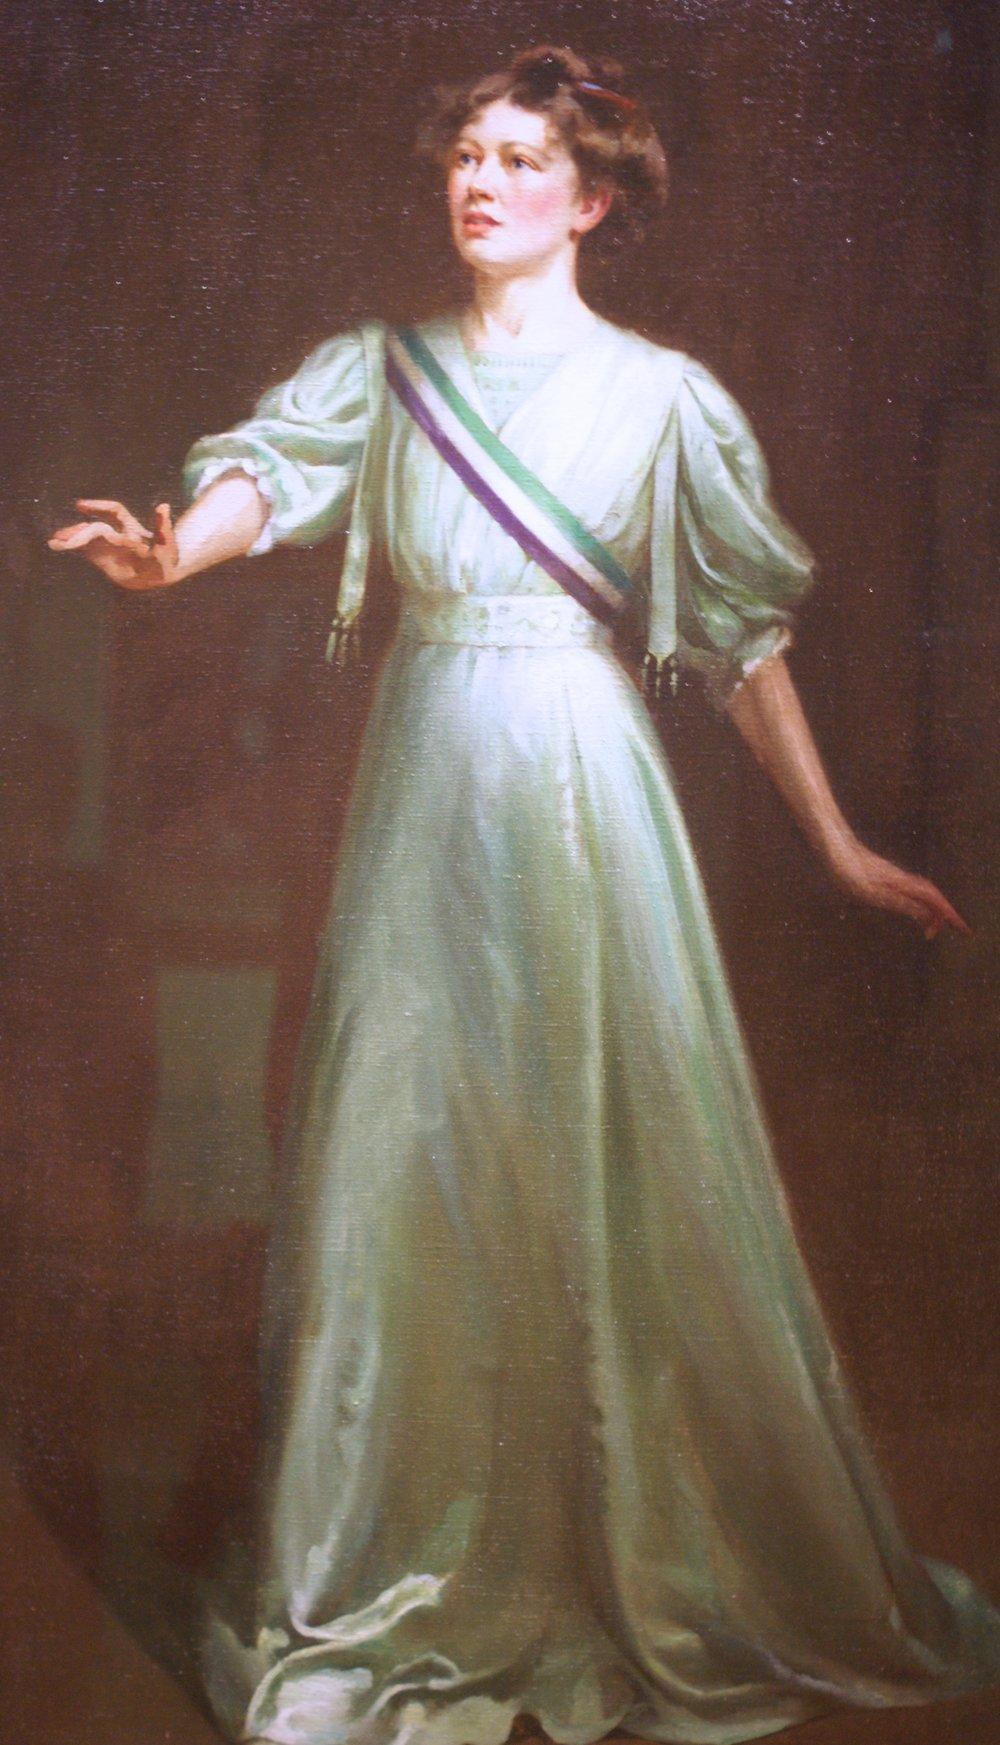 Christabel Pankhurst, 1909